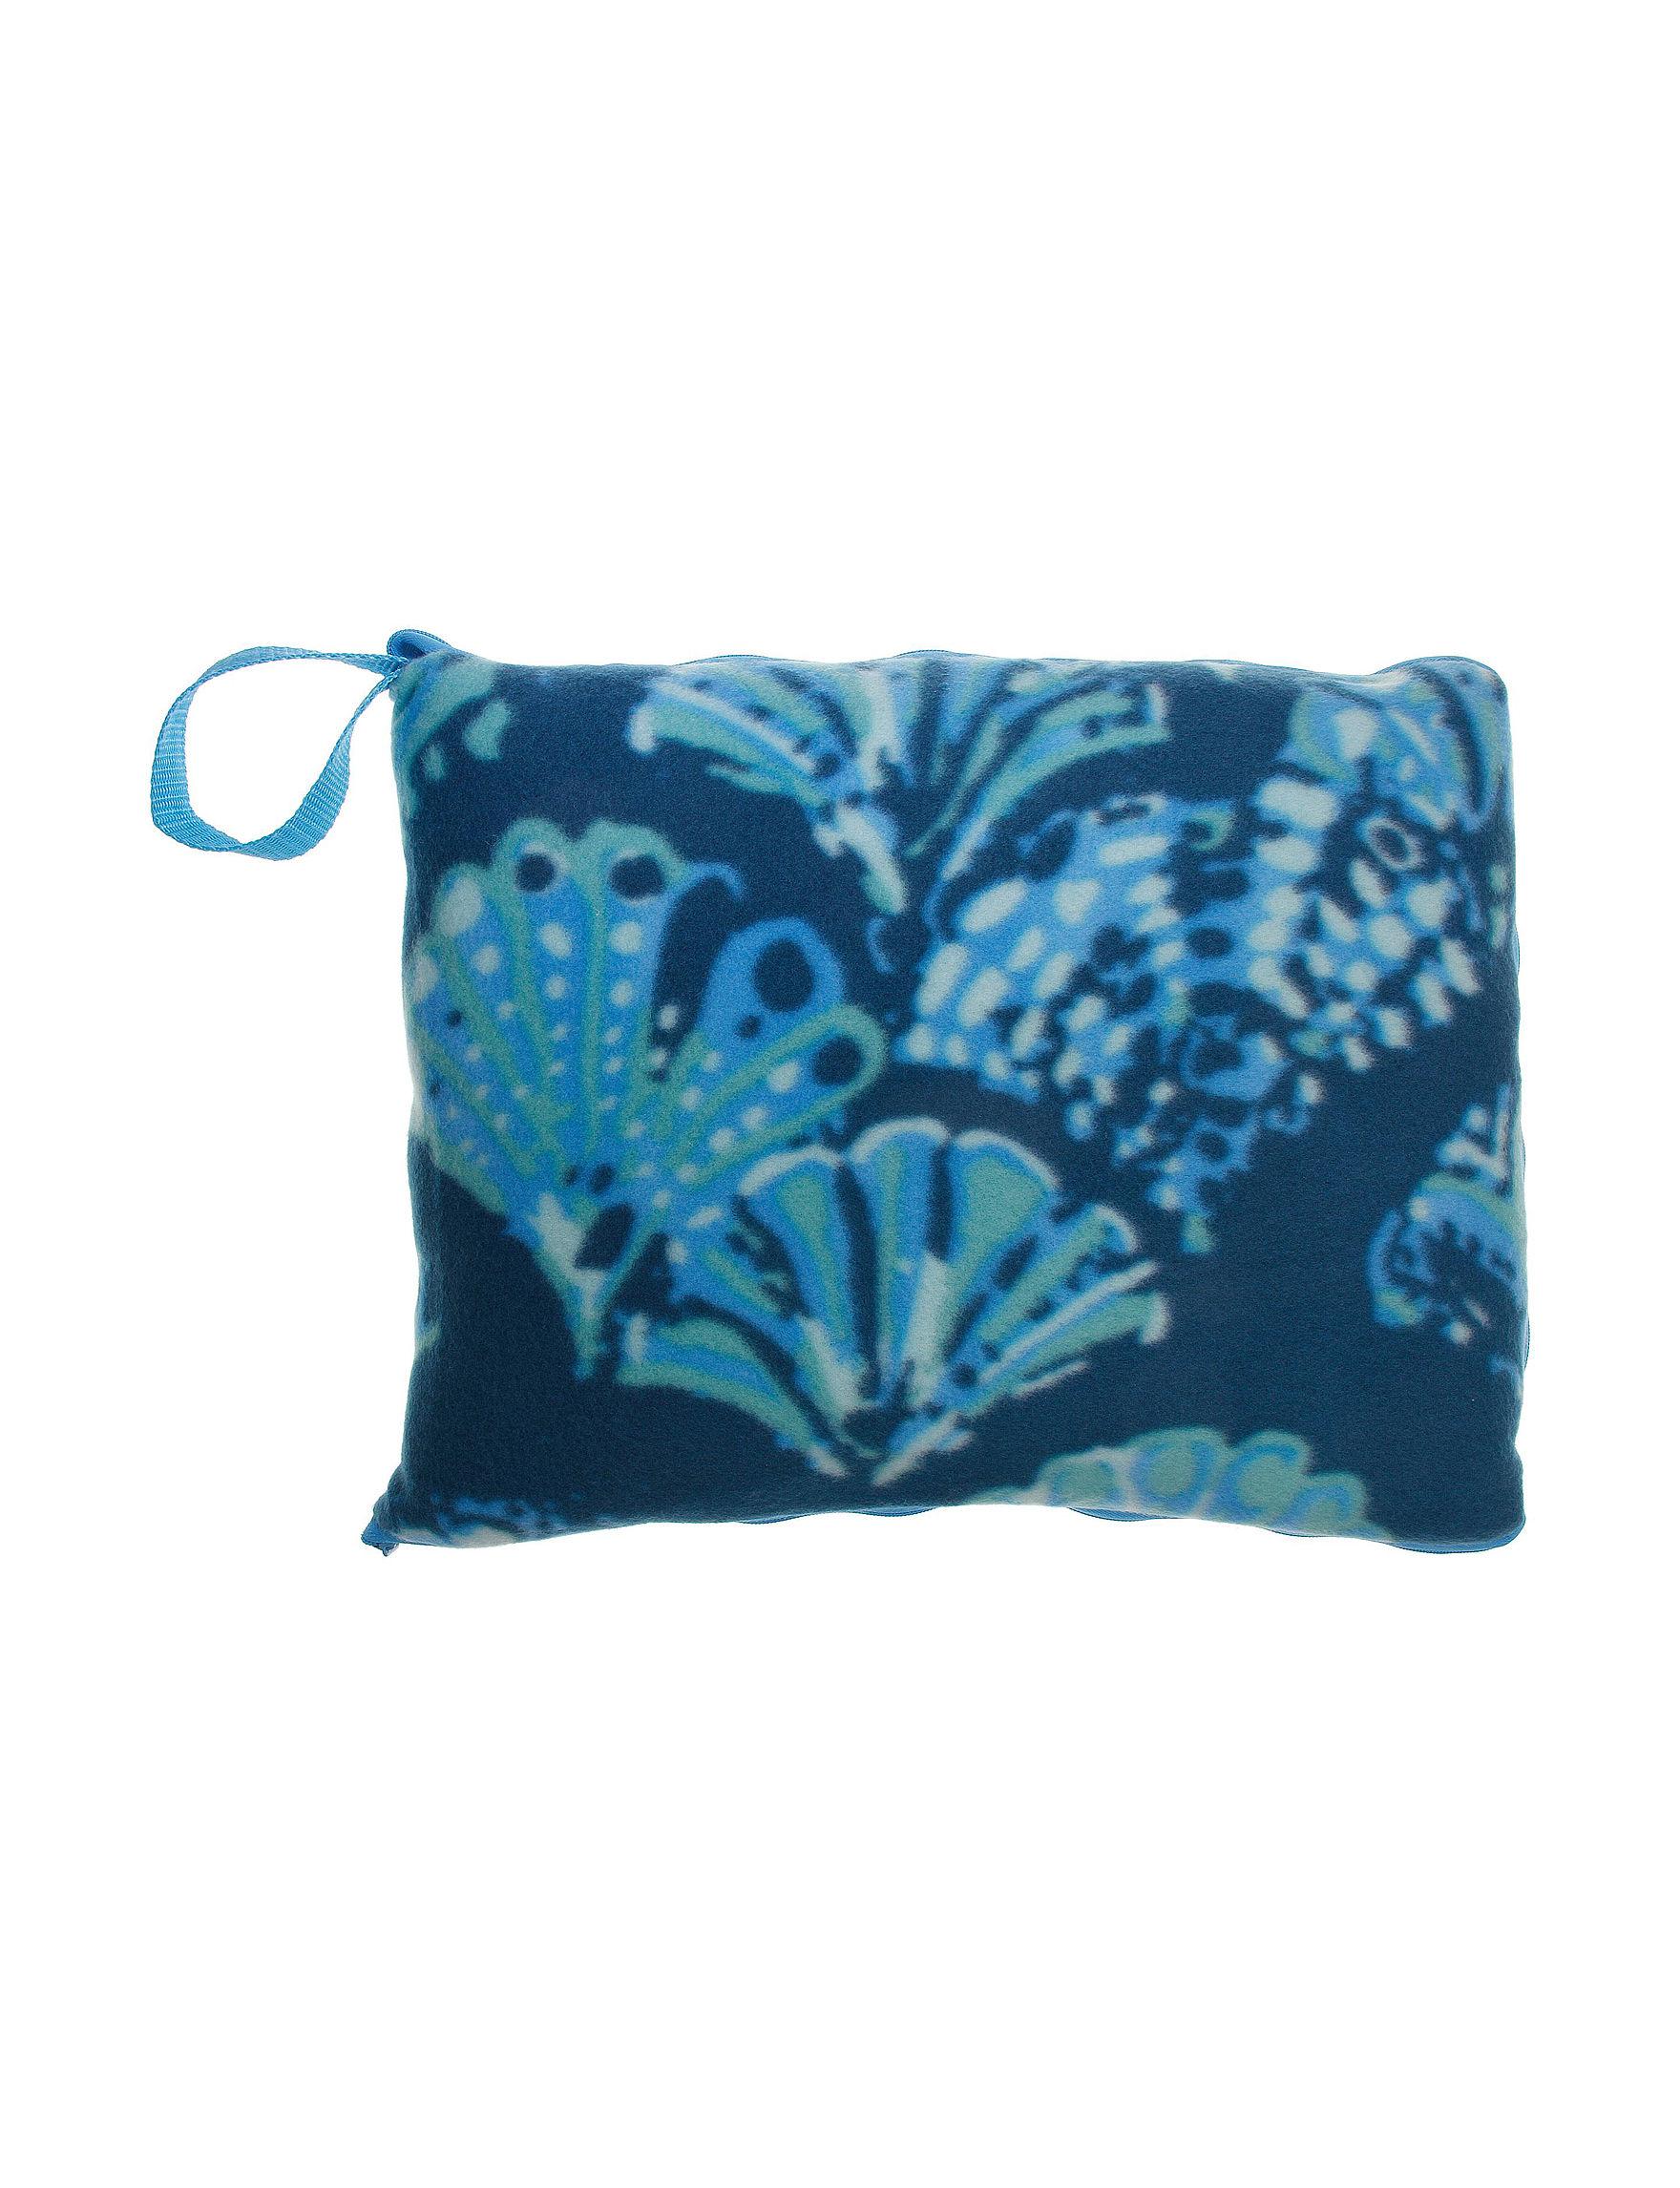 Uncas Blue Accessories Blankets & Throws Travel Accessories